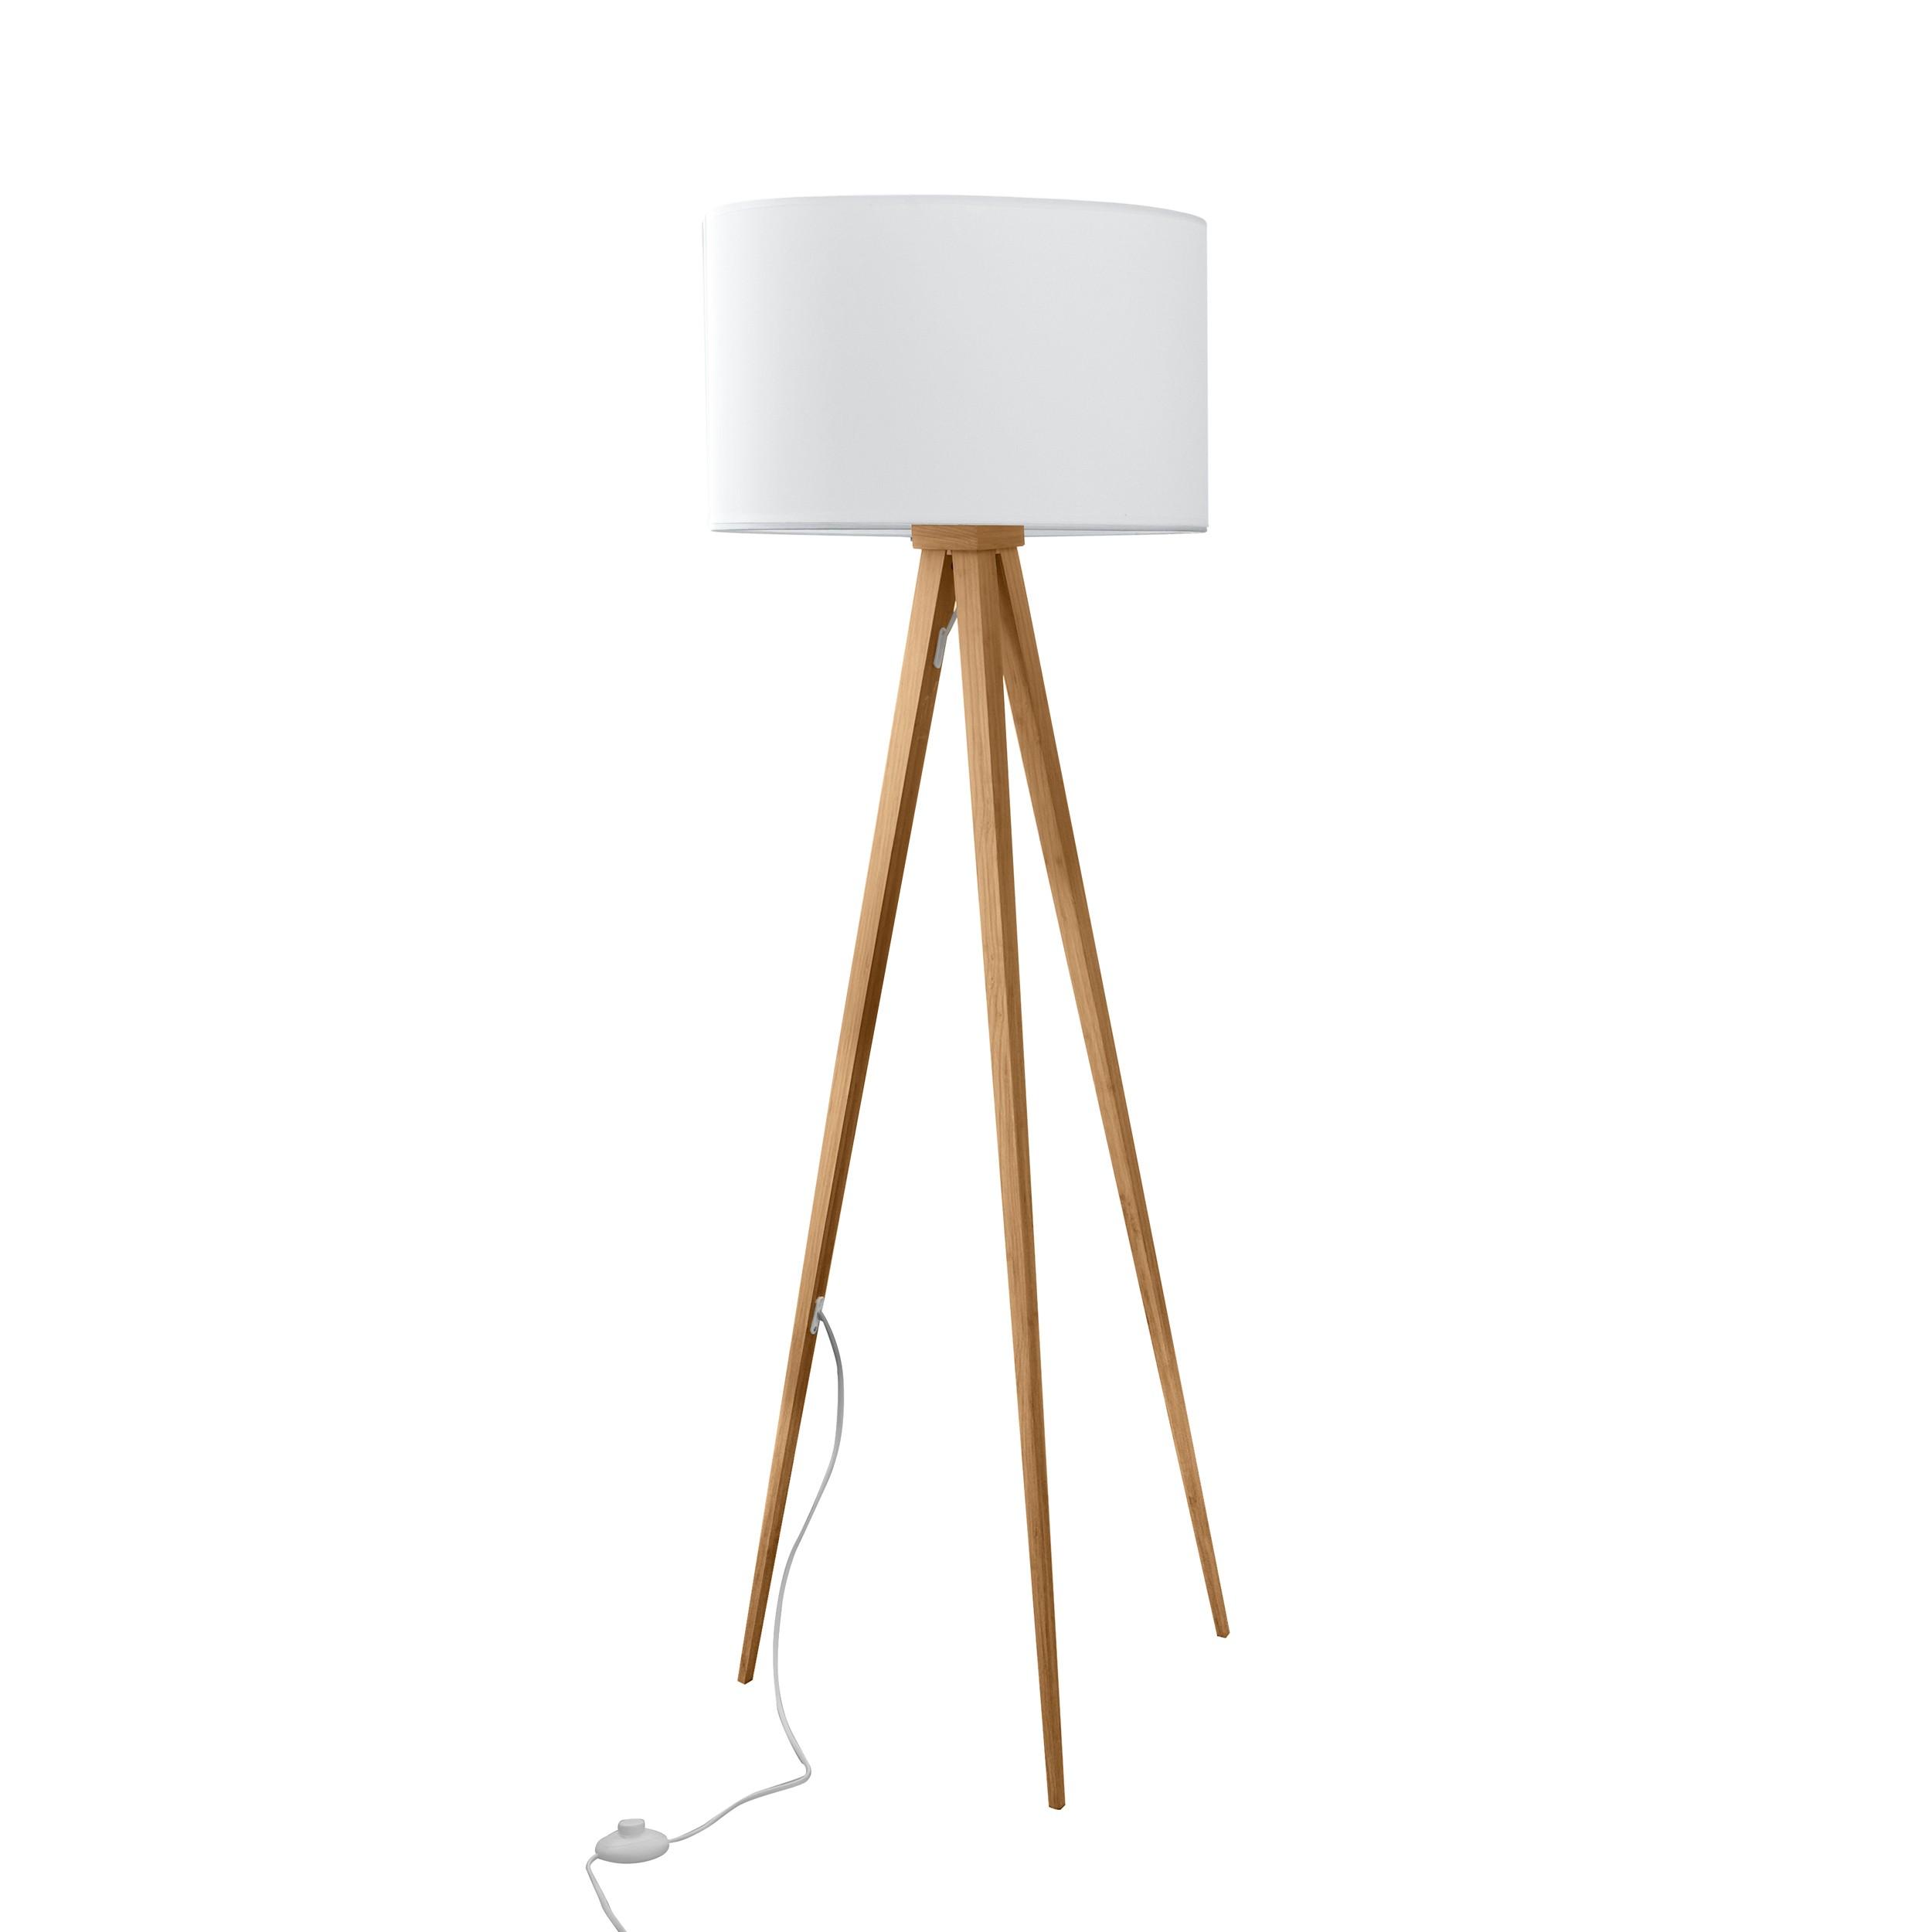 achat lampadaire trepied bois blanc